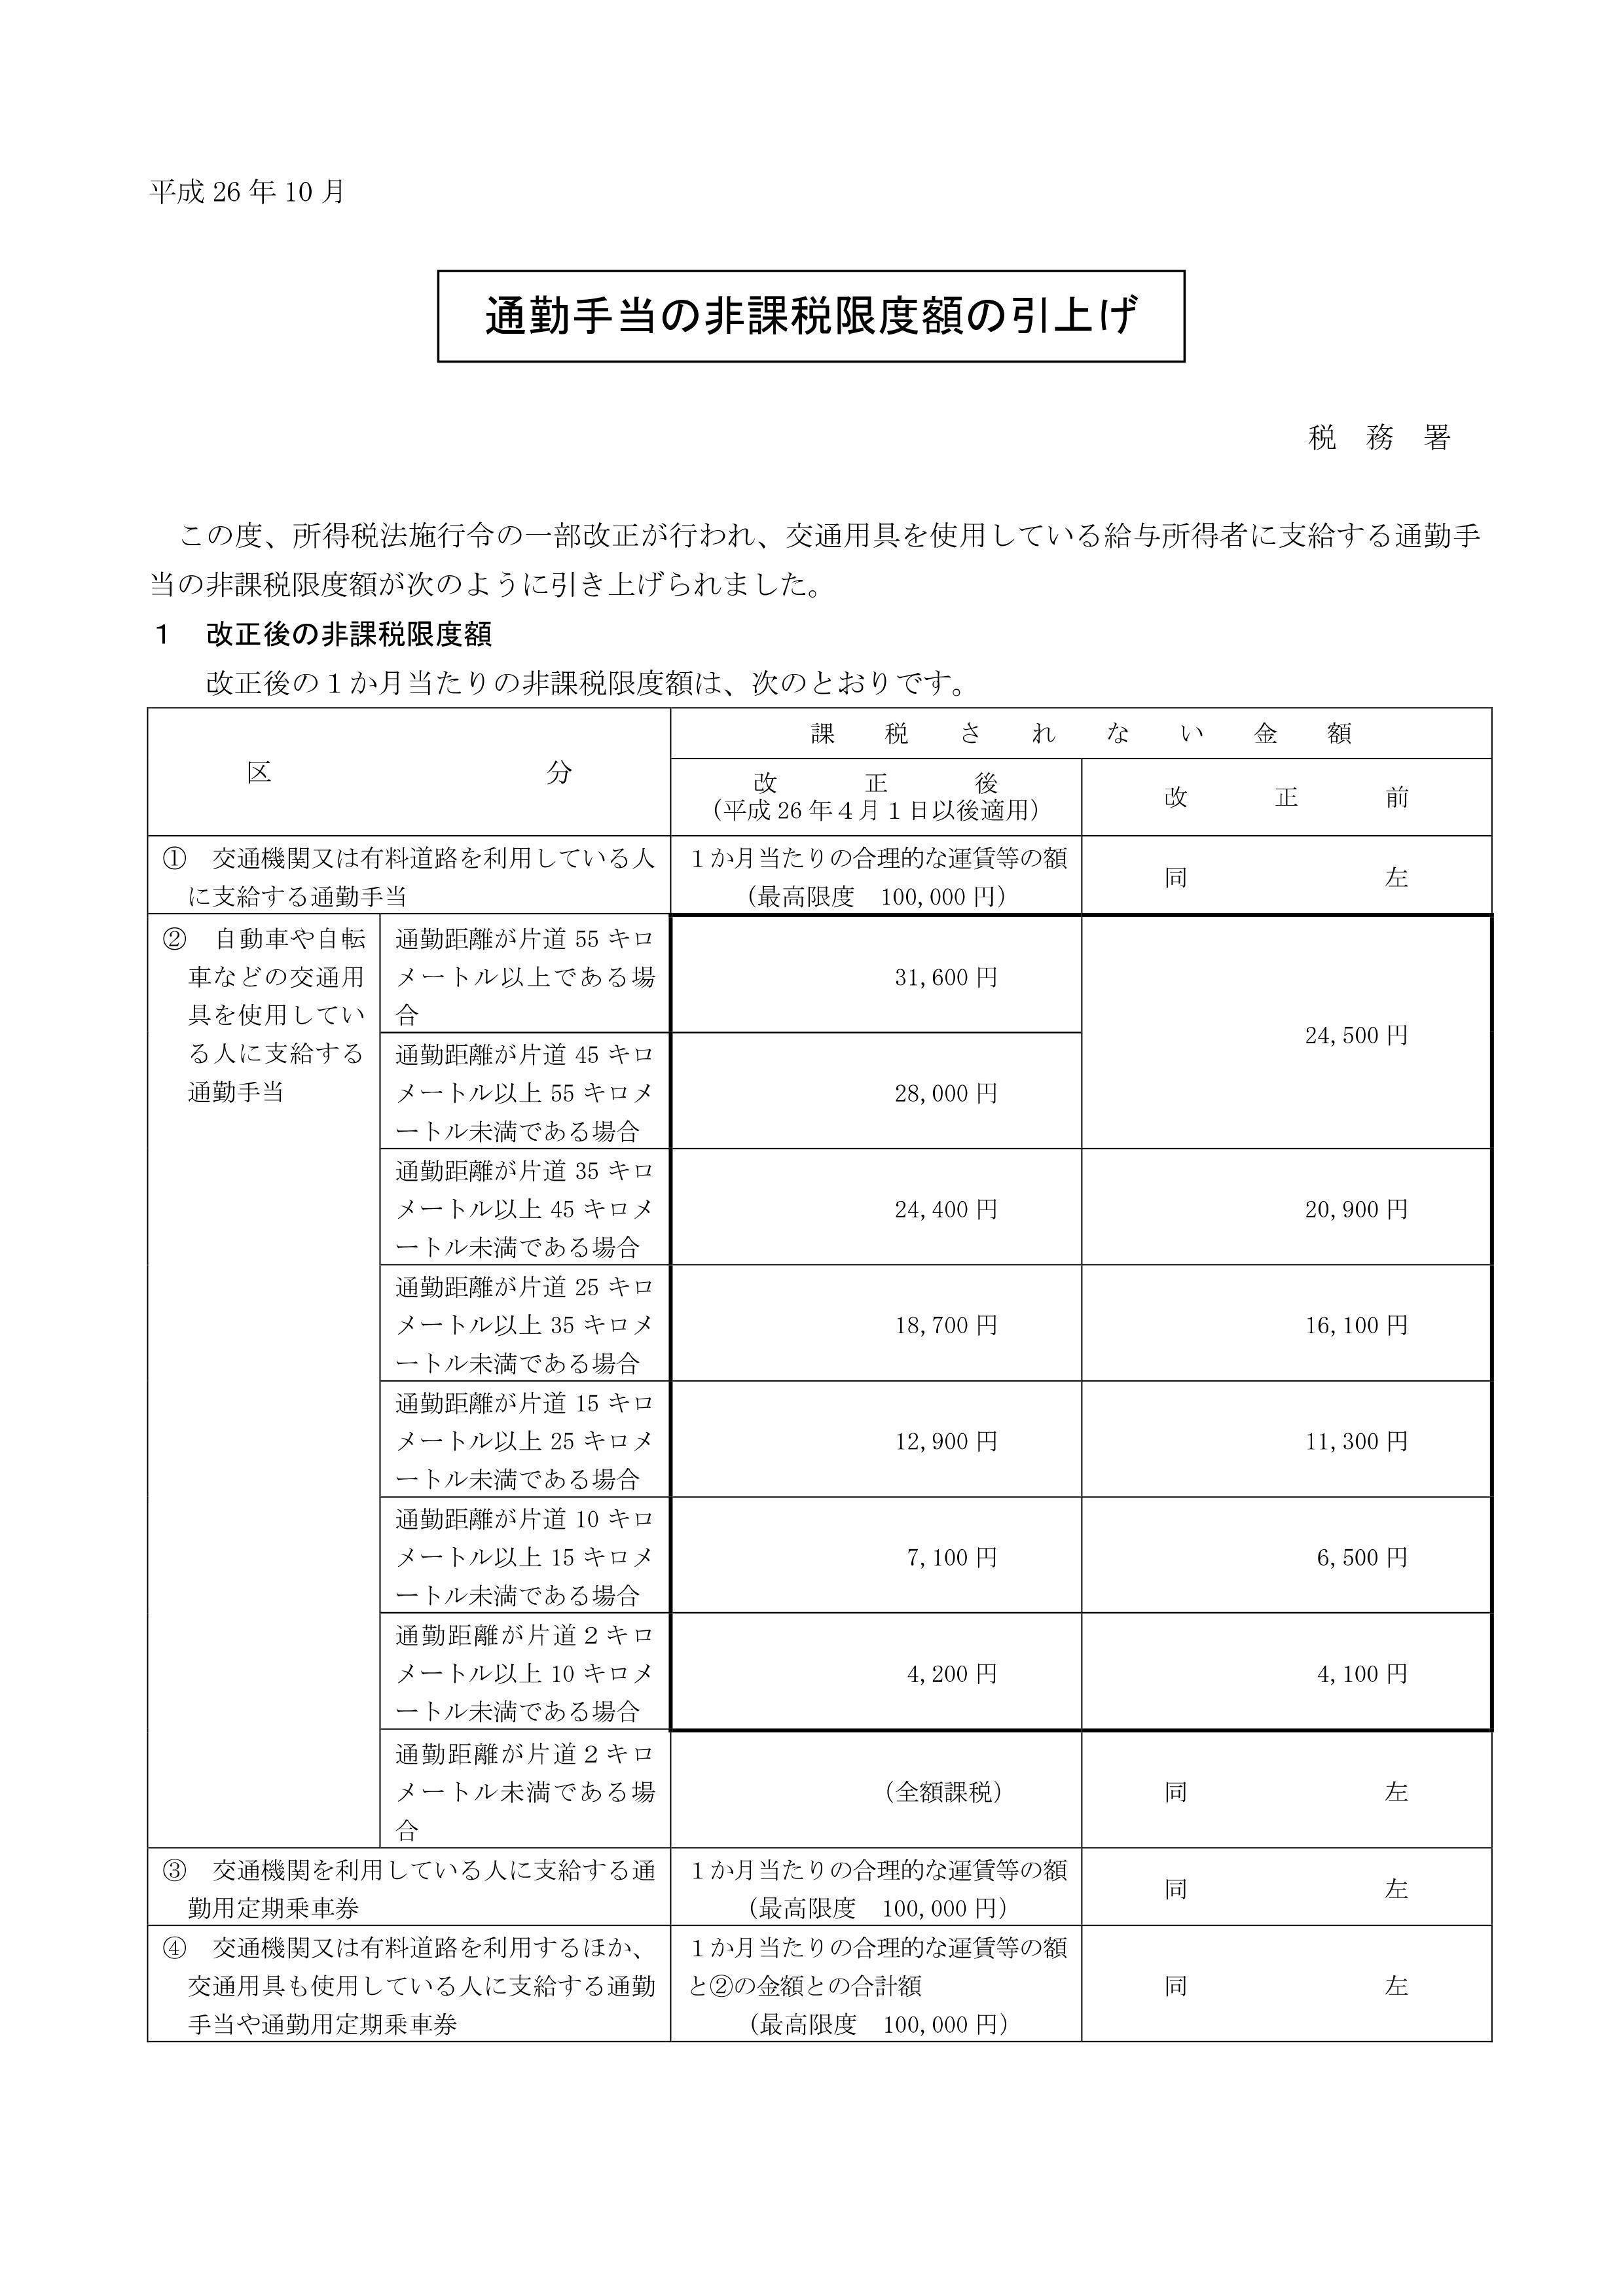 https___www.nta.go.jp_gensen_tsukin_pdf_01_01